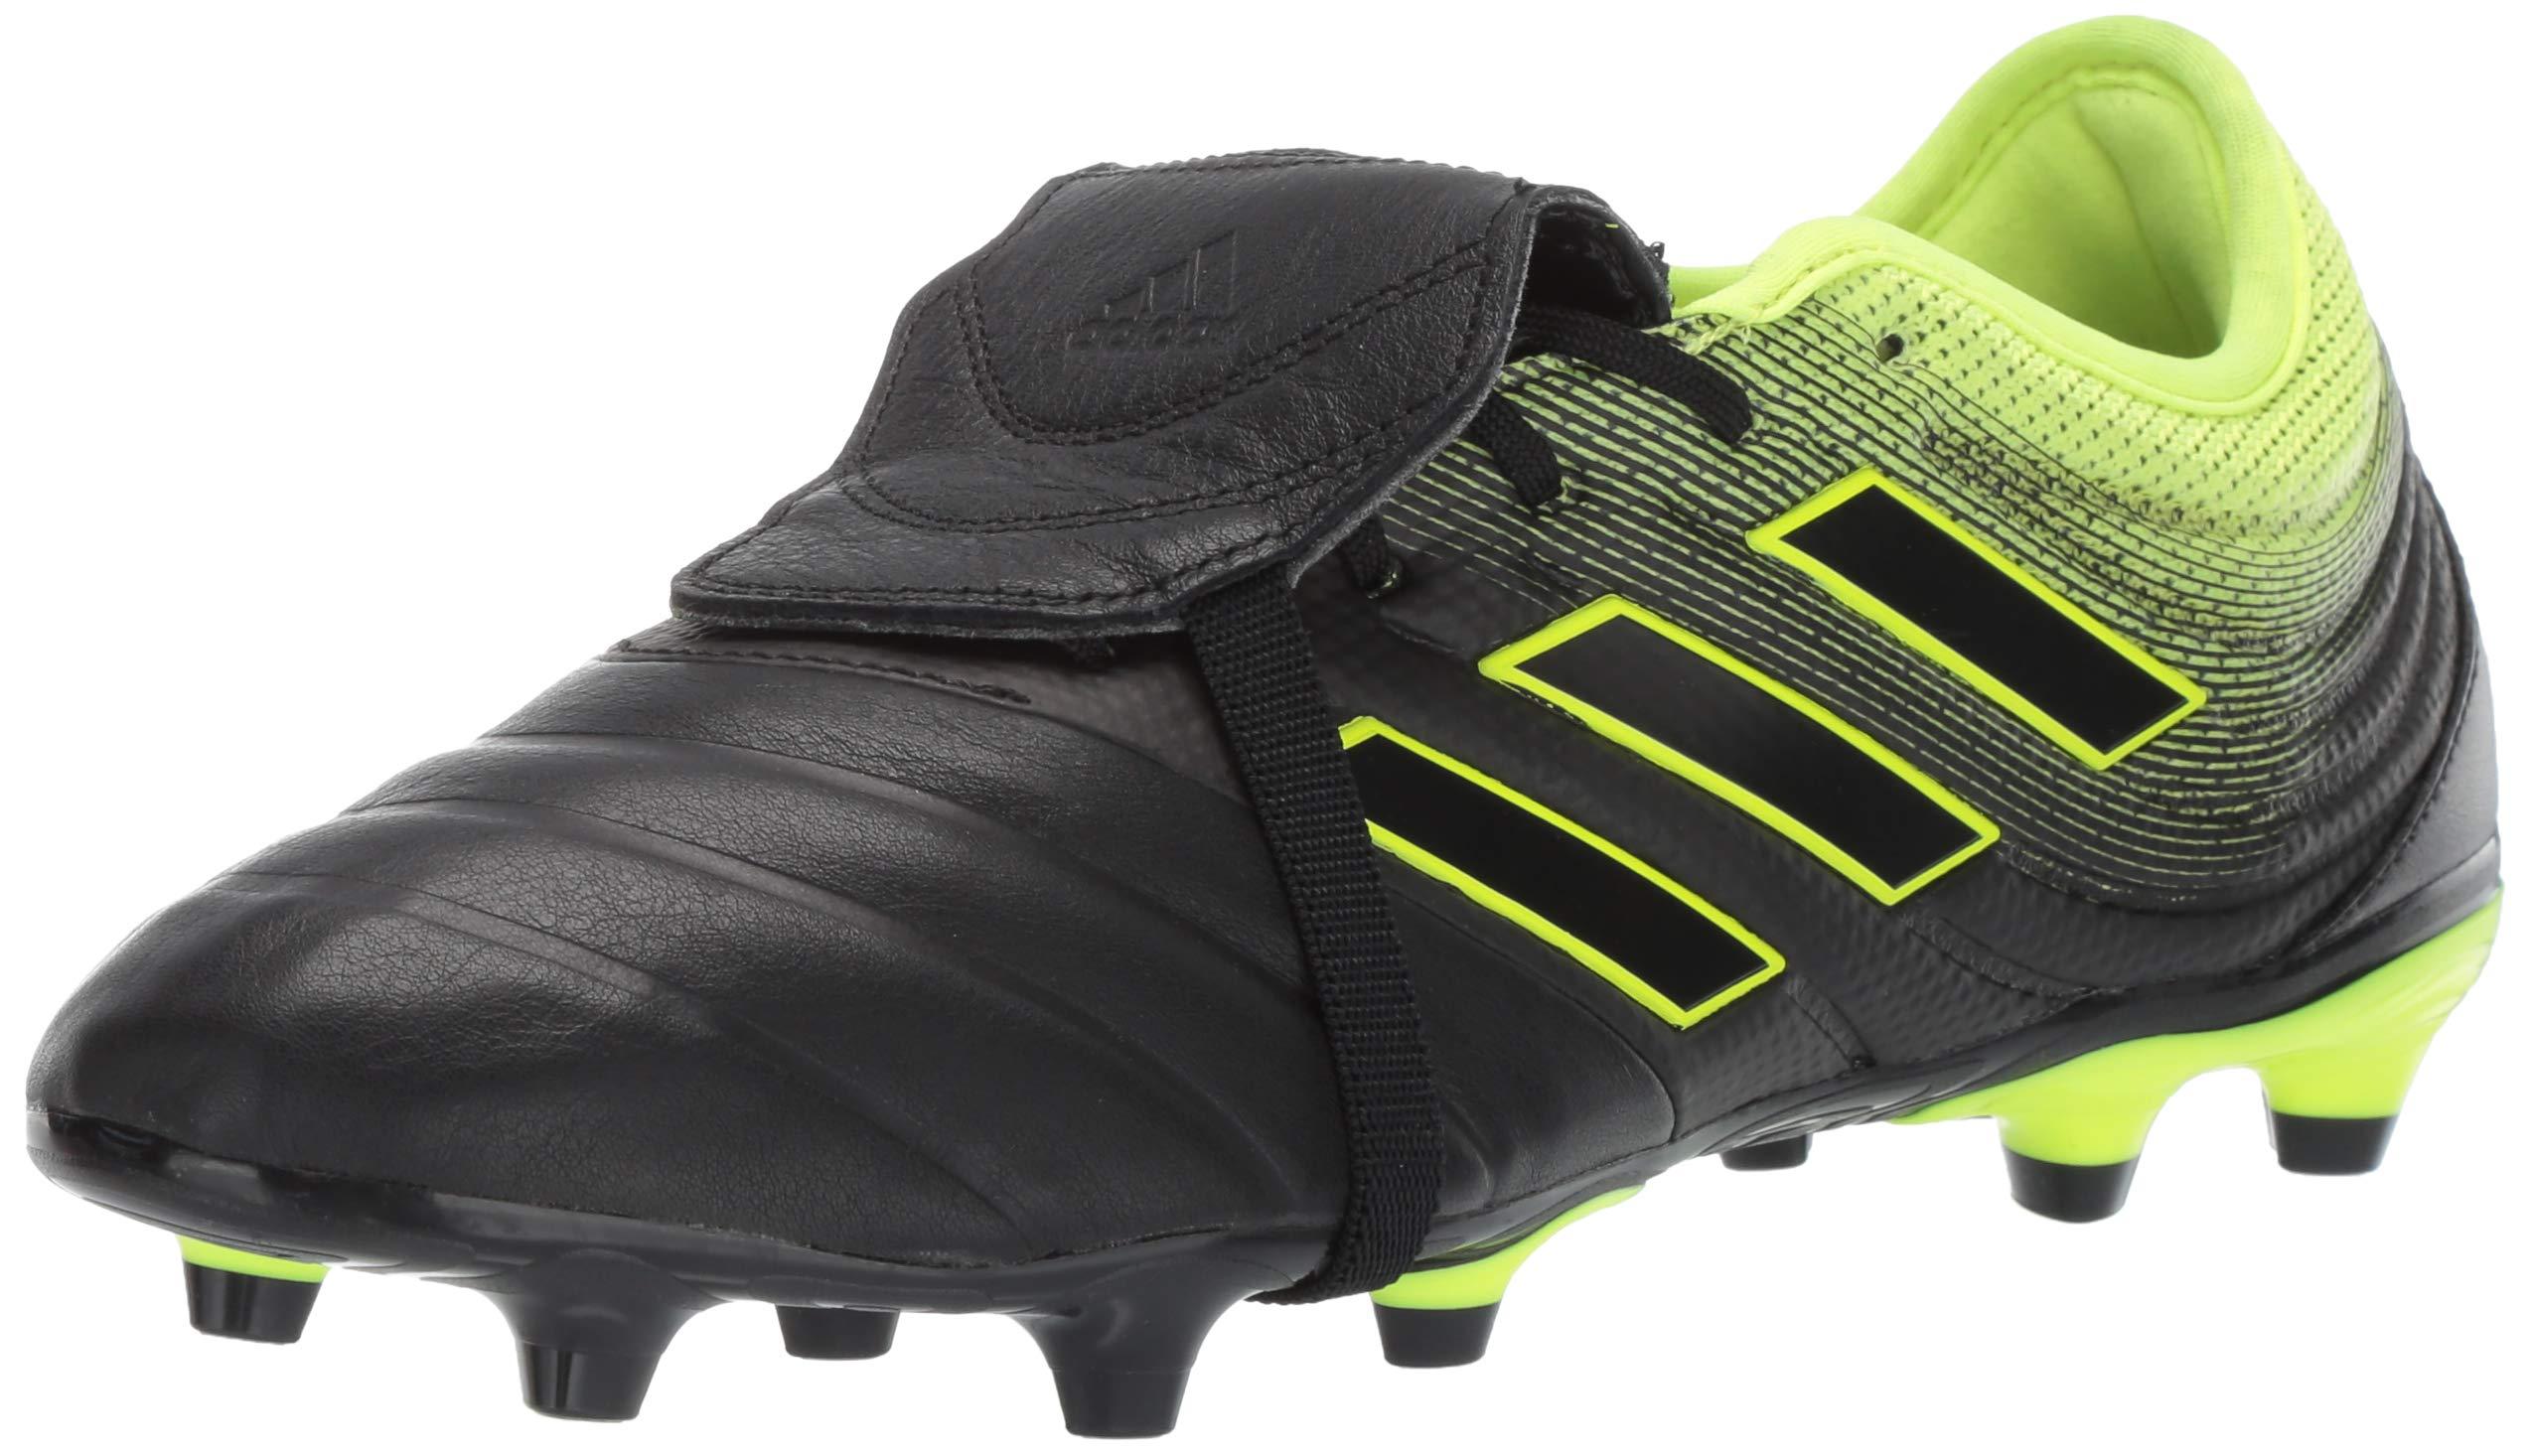 adidas Men's Copa Gloro 19.2 Firm Ground, Black/Solar Yellow, 6.5 M US